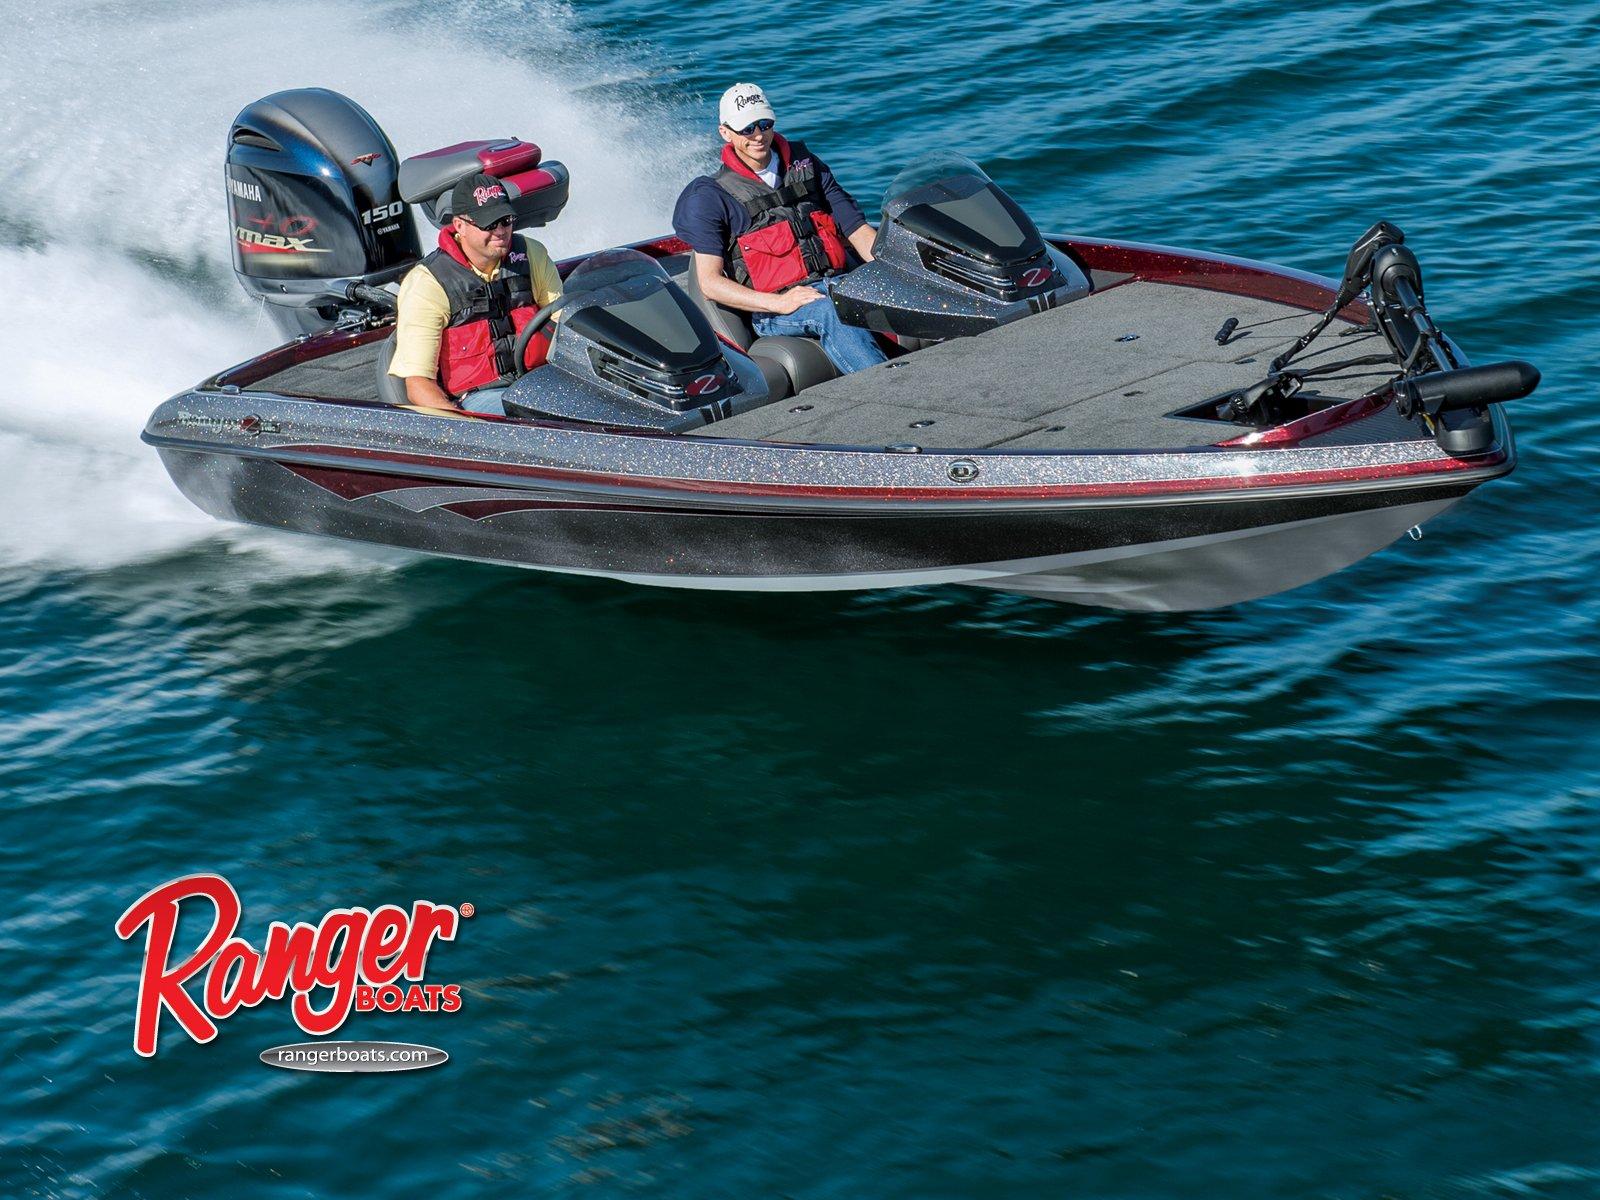 Ranger Boats Wallpaper Ranger boats wallpaper 1600x1200